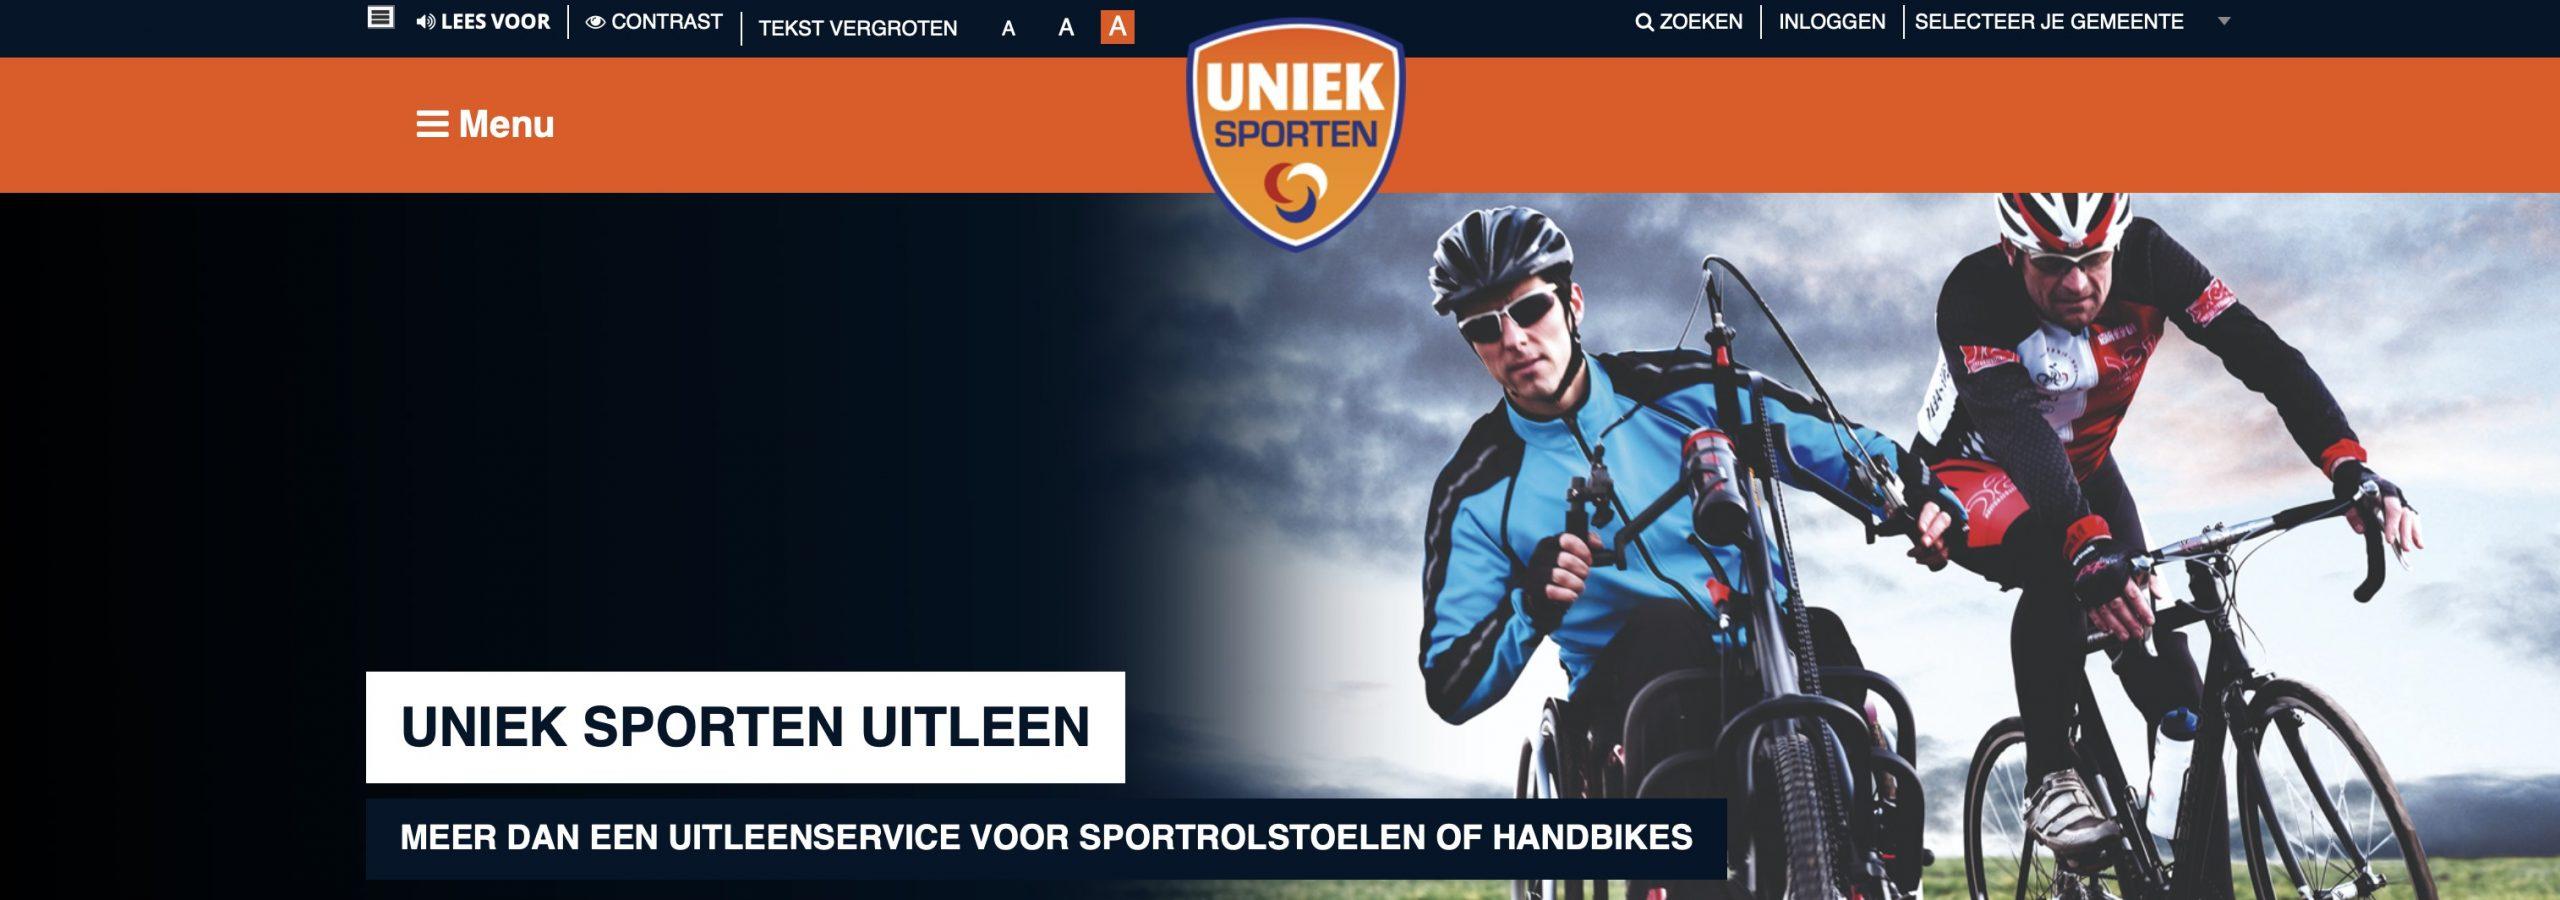 Header website uniek sporten